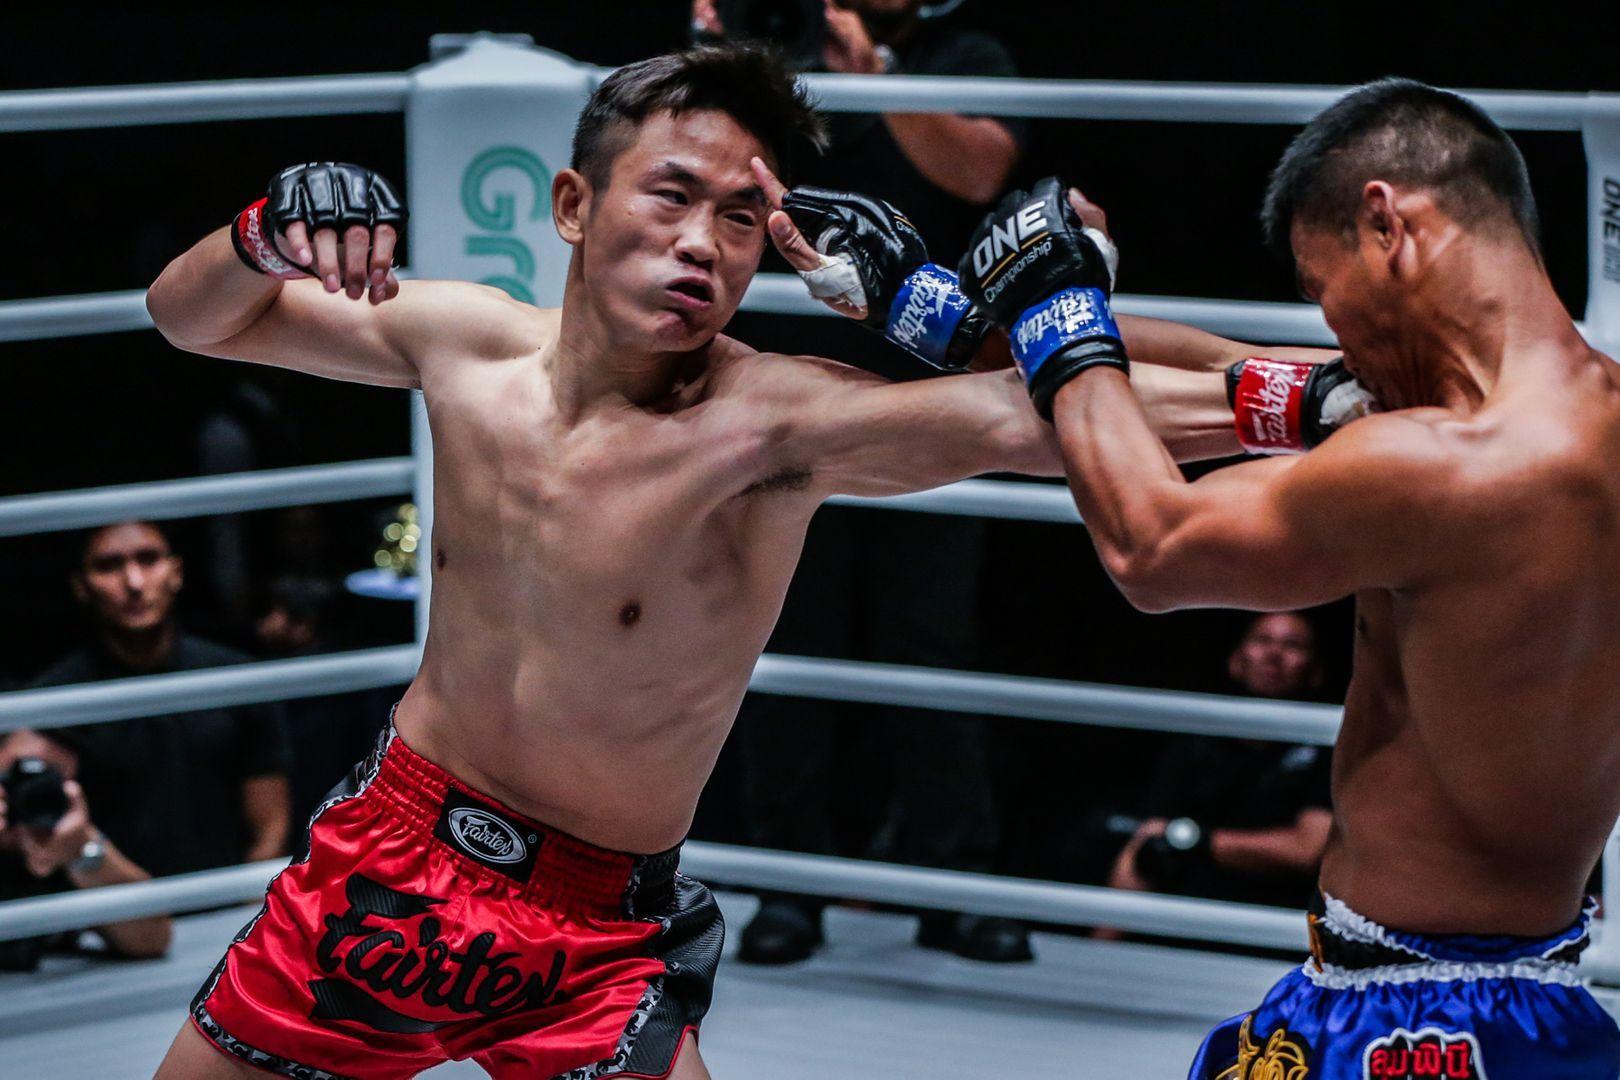 Han Zi Hao attacks Kongsak PK.Saenchaimuaythaigym at ONE MASTERS OF FATE